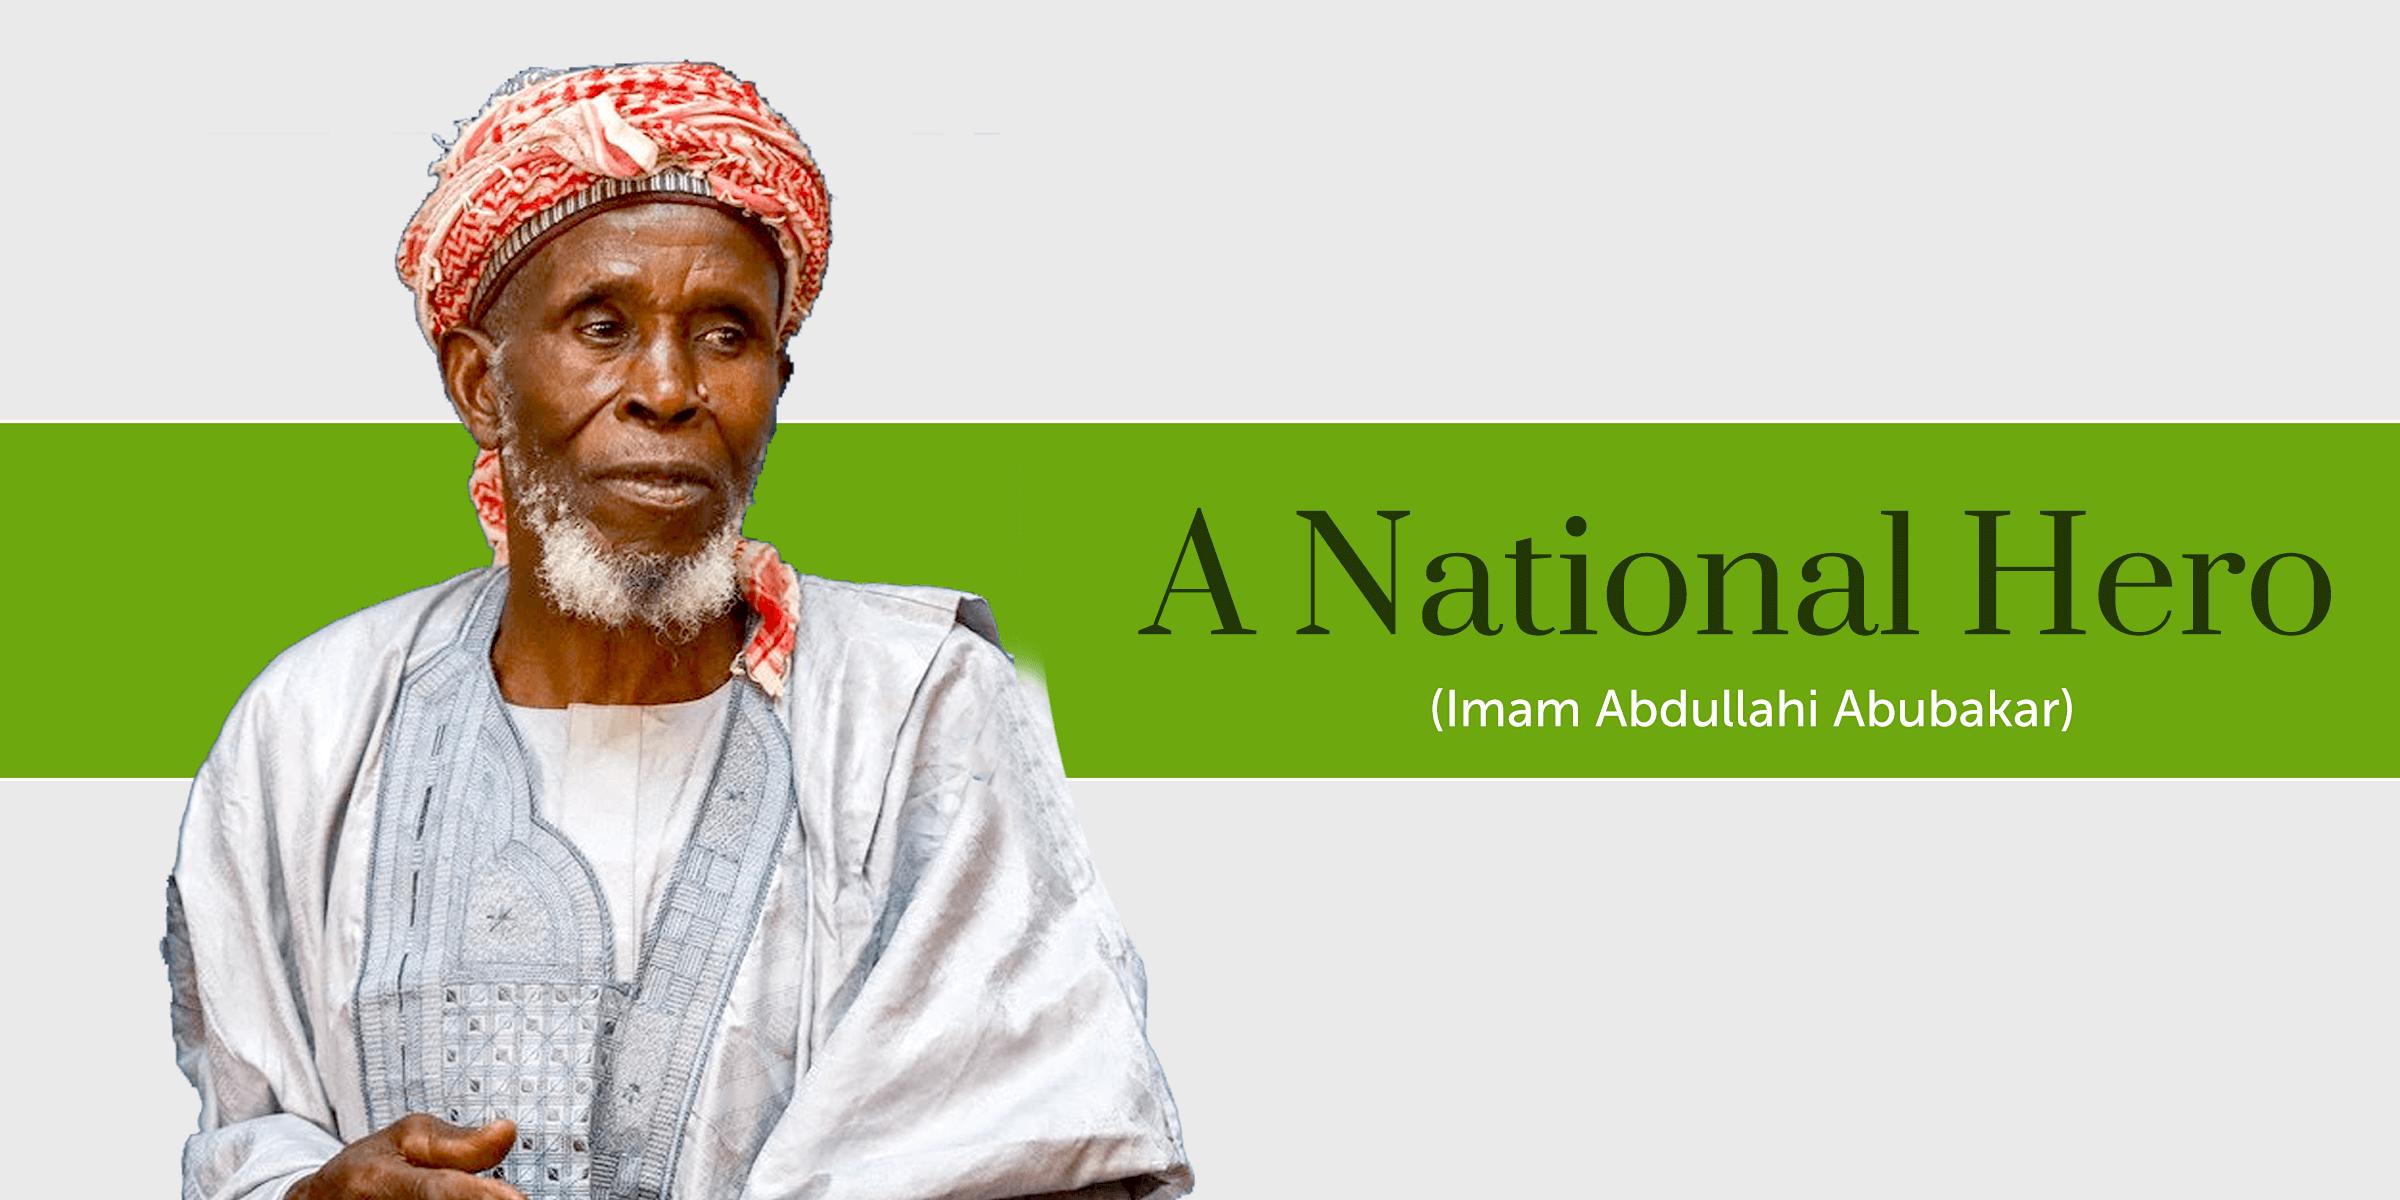 Imam Abdullahi Abubakar Who Saved Christians Got Humanitarian Award